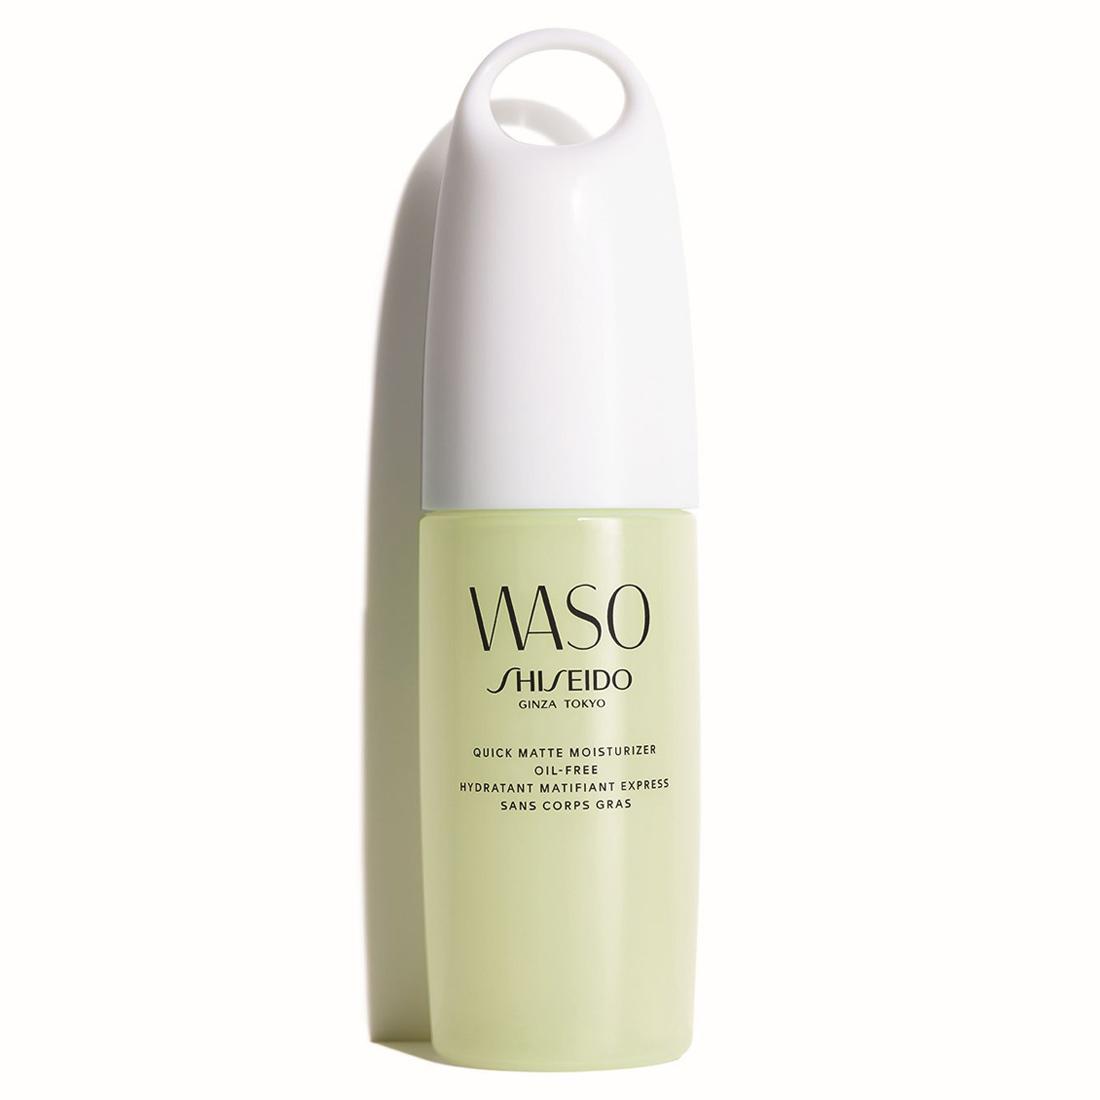 Waso Hydratant Matifiant Express - Shiseido